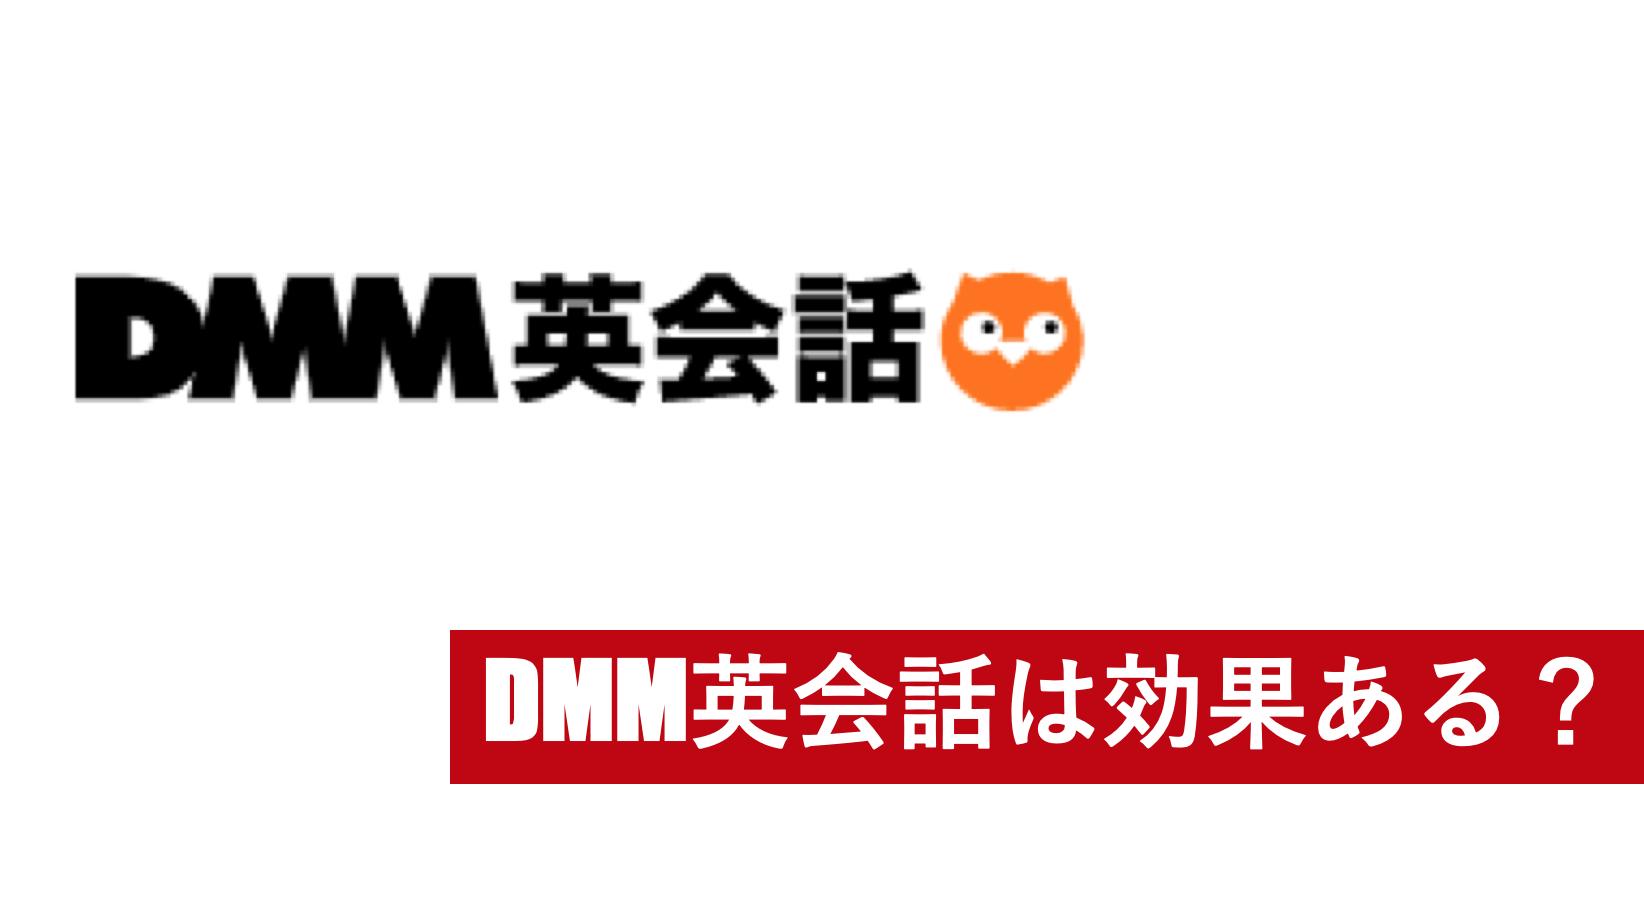 DMM英会話の効果は?実際に使った結果をレビュー。効果的な使い方を解説します